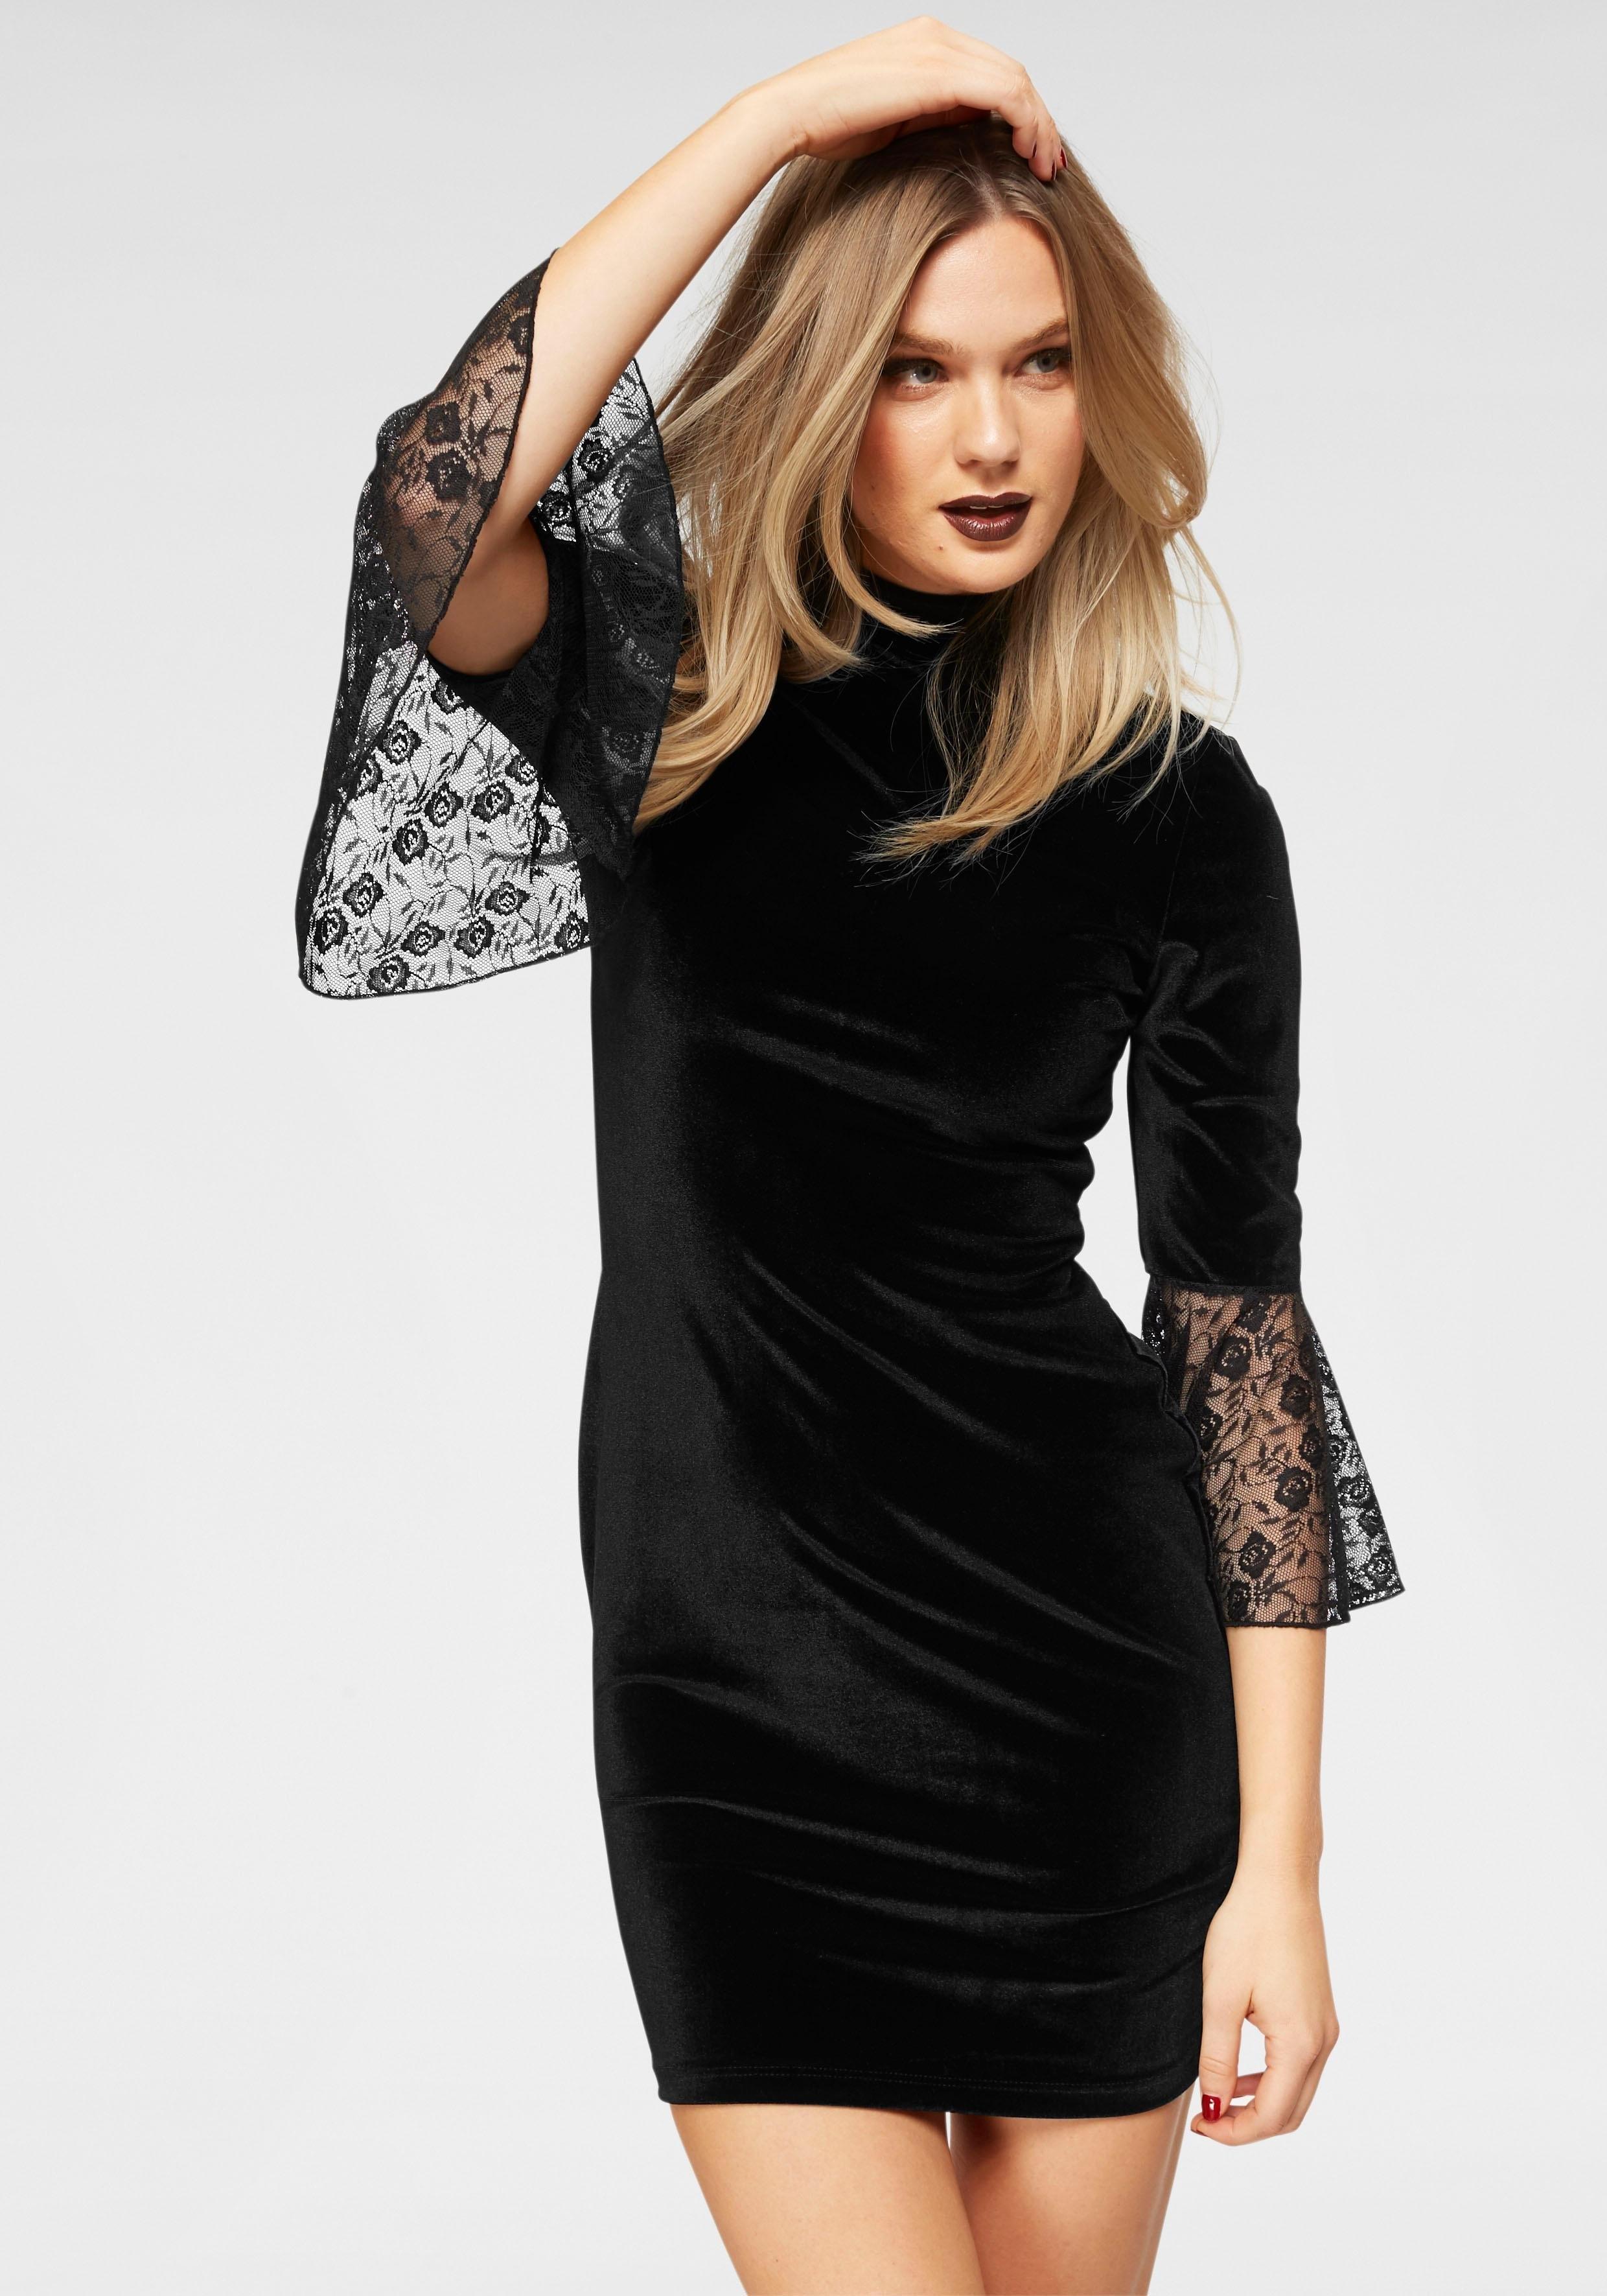 melrose fluwelen jurk nu online kopen bij OTTO